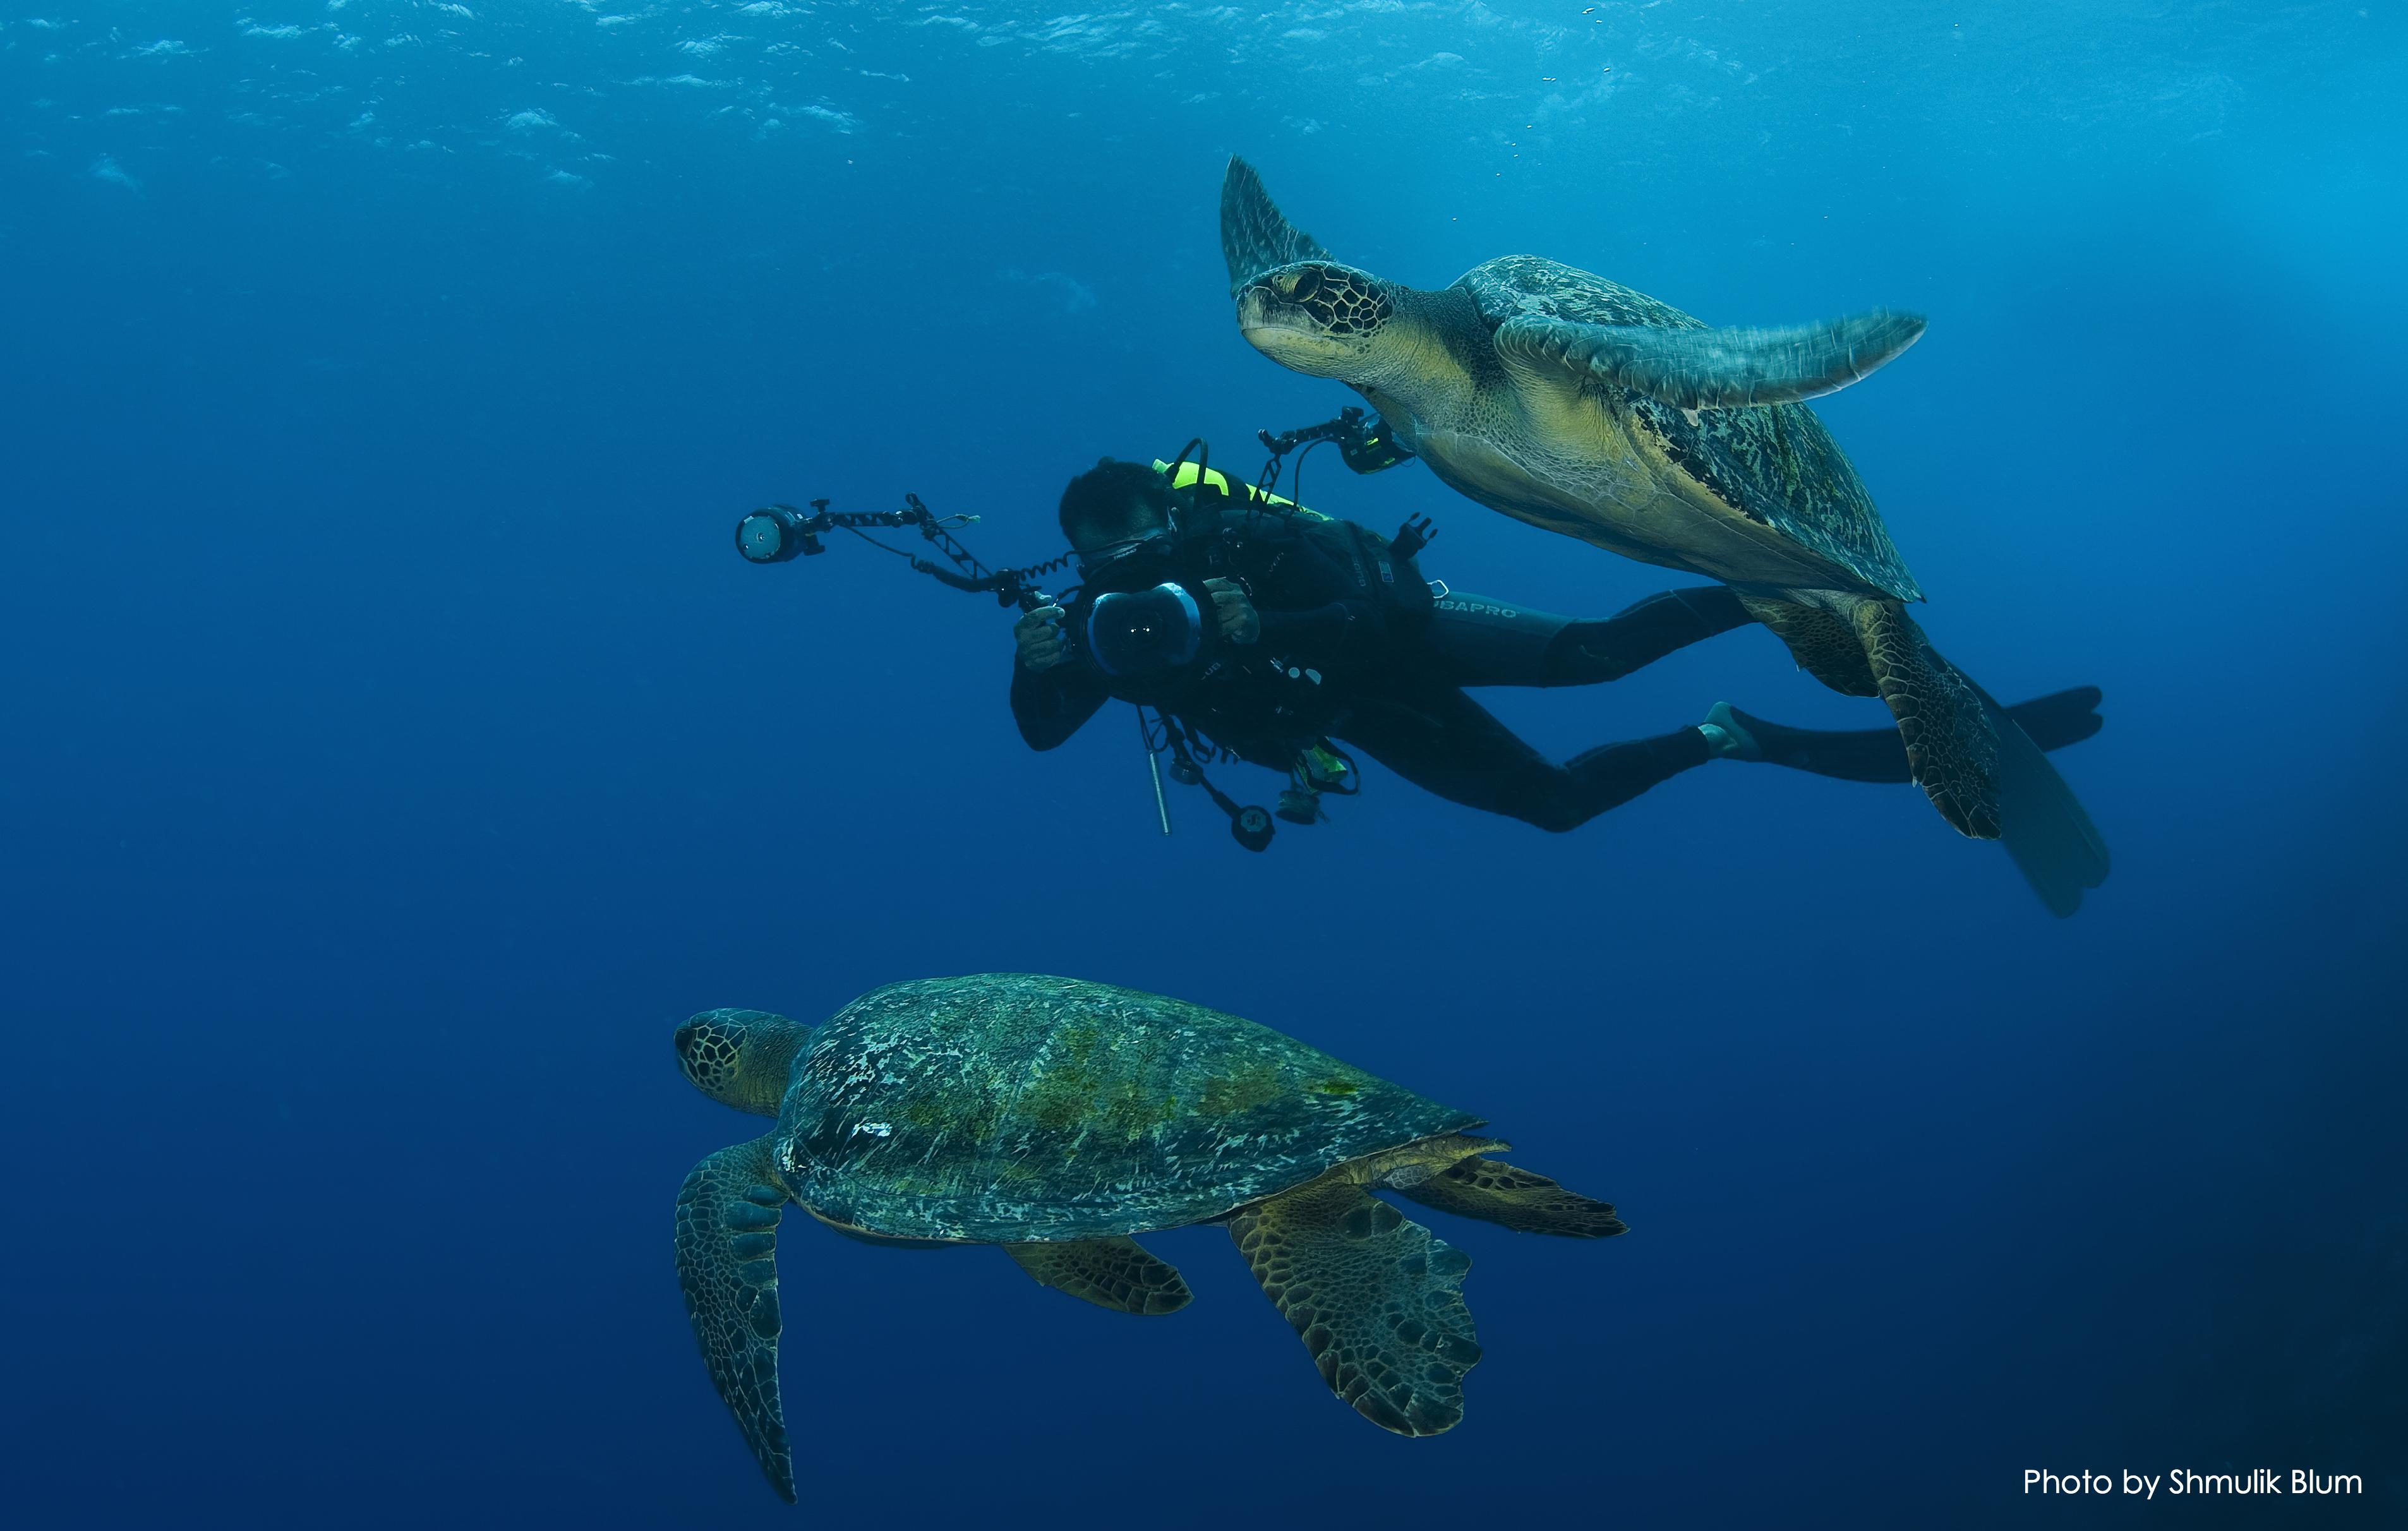 Sea Turtles Photo by Shmulik Blum